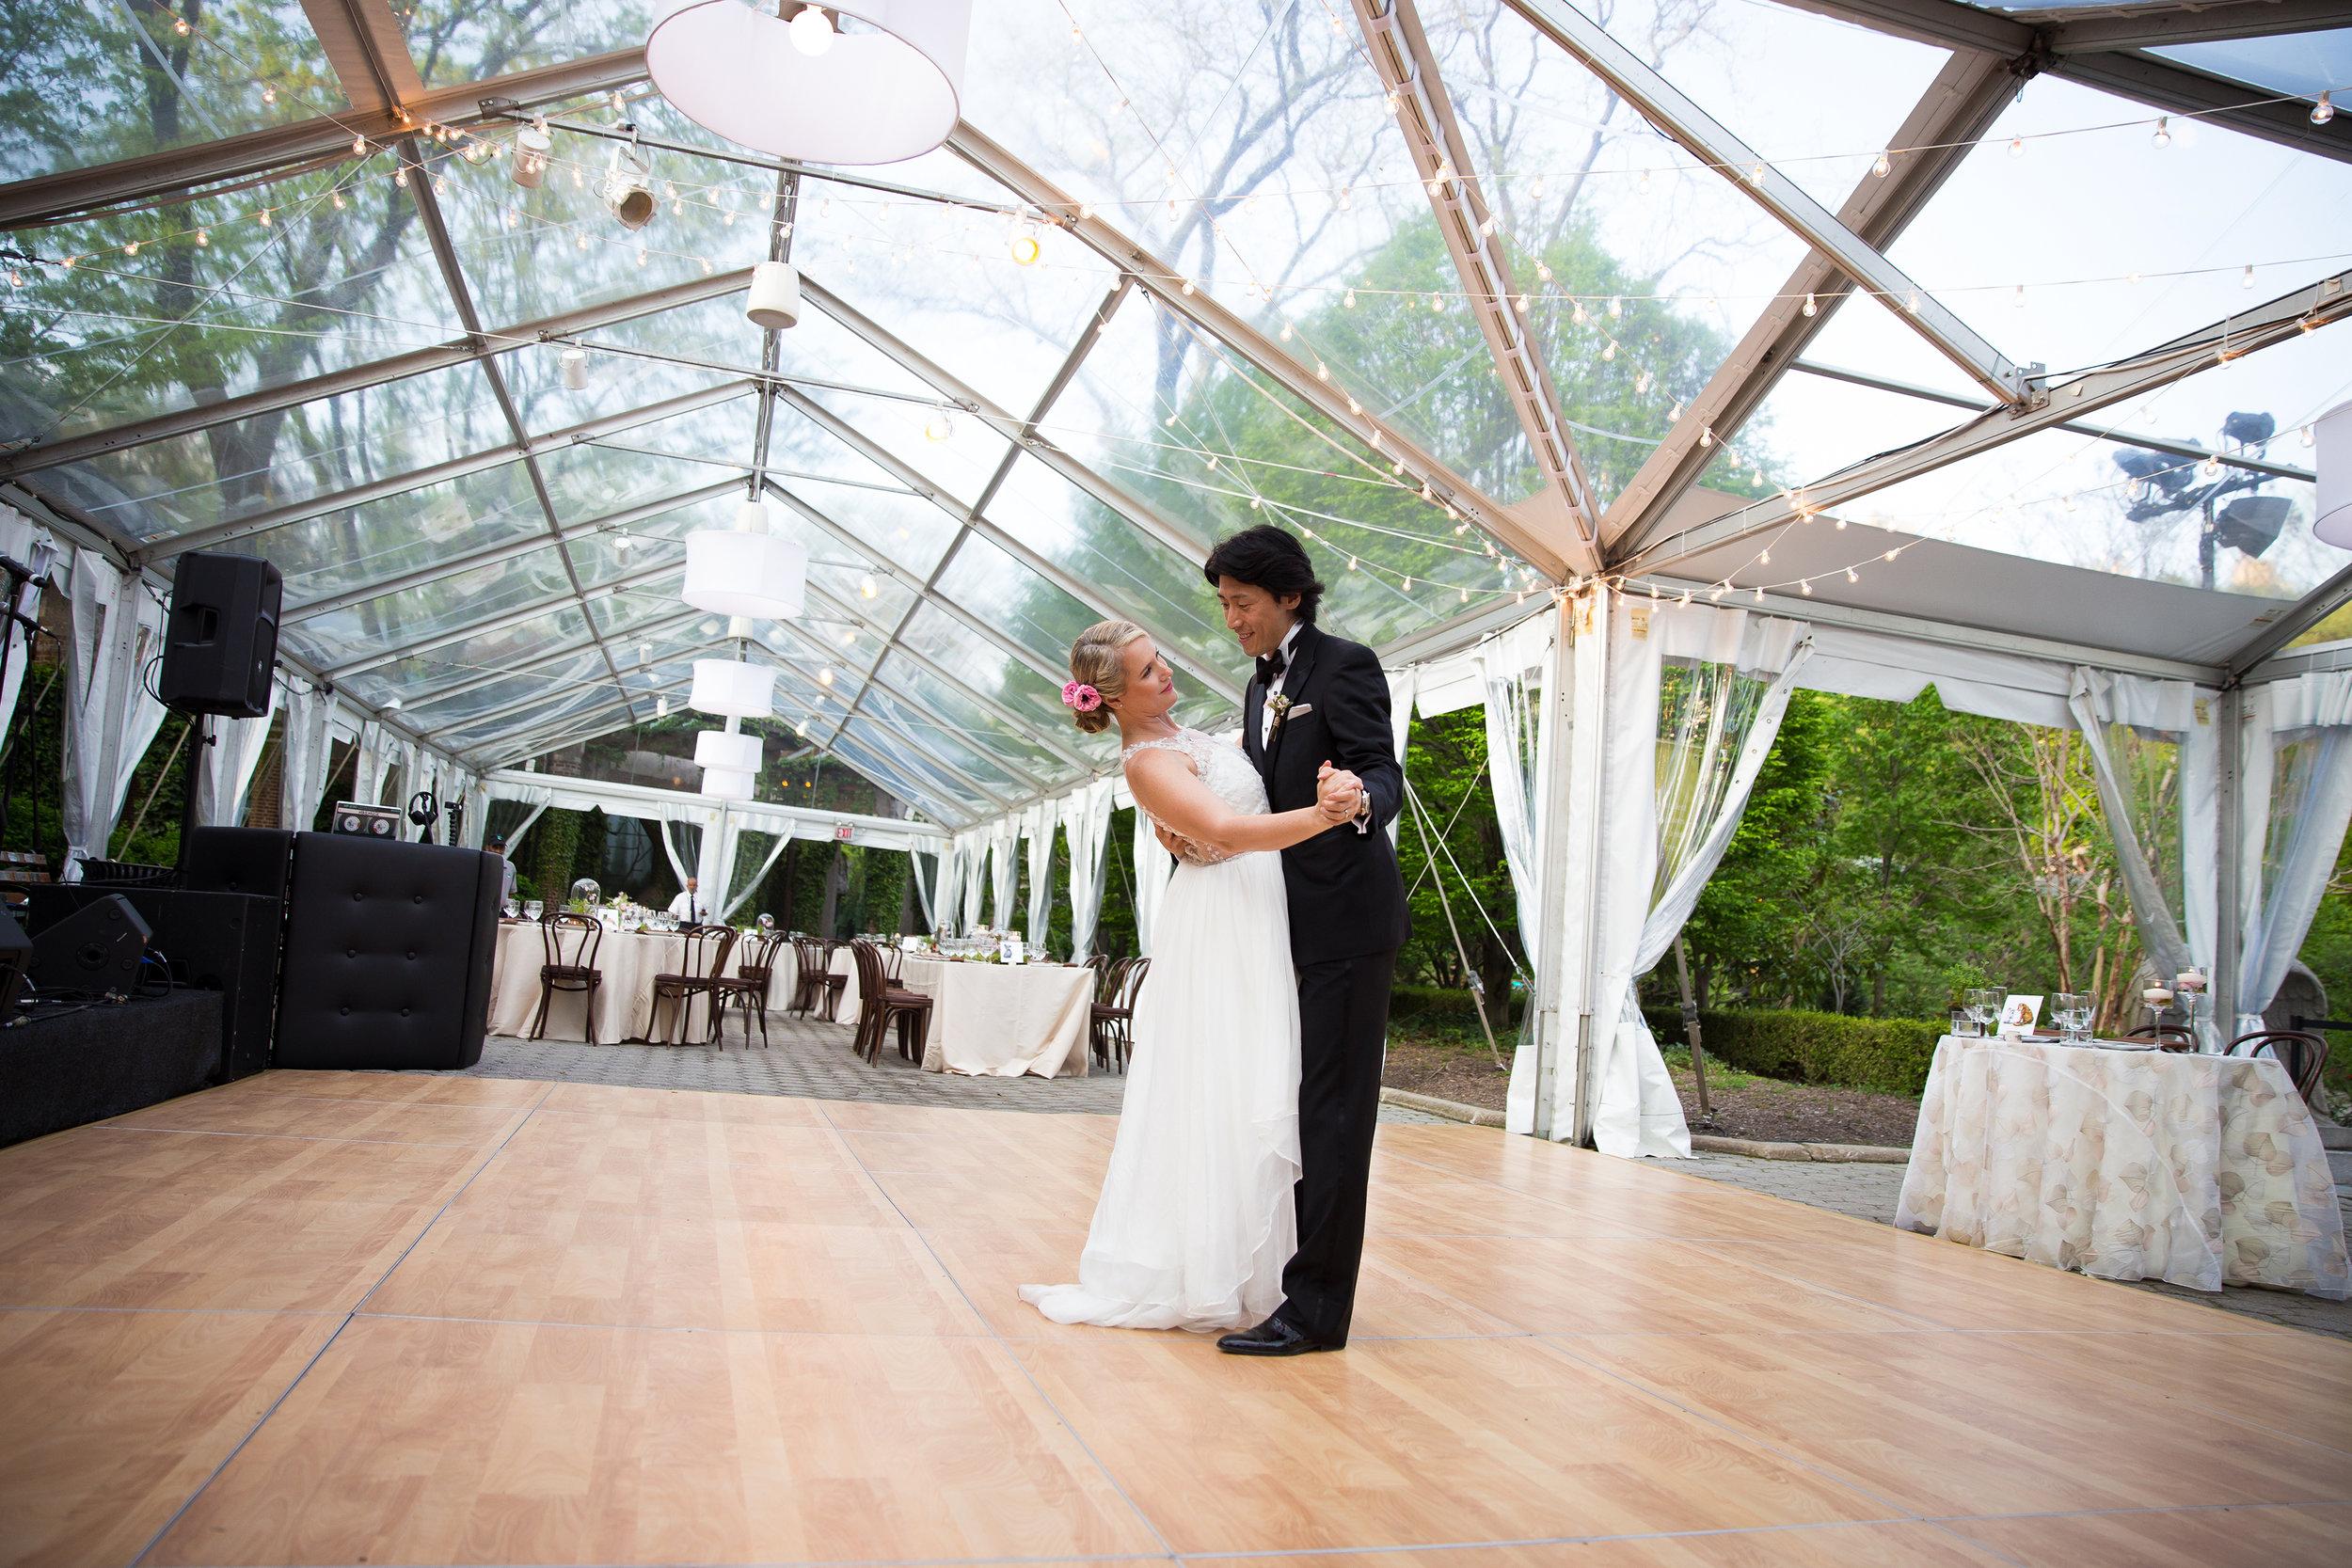 victorious-events-nyc-028-colleen-taka-central-park-zoo-wedding-raymond-hamlin.jpg